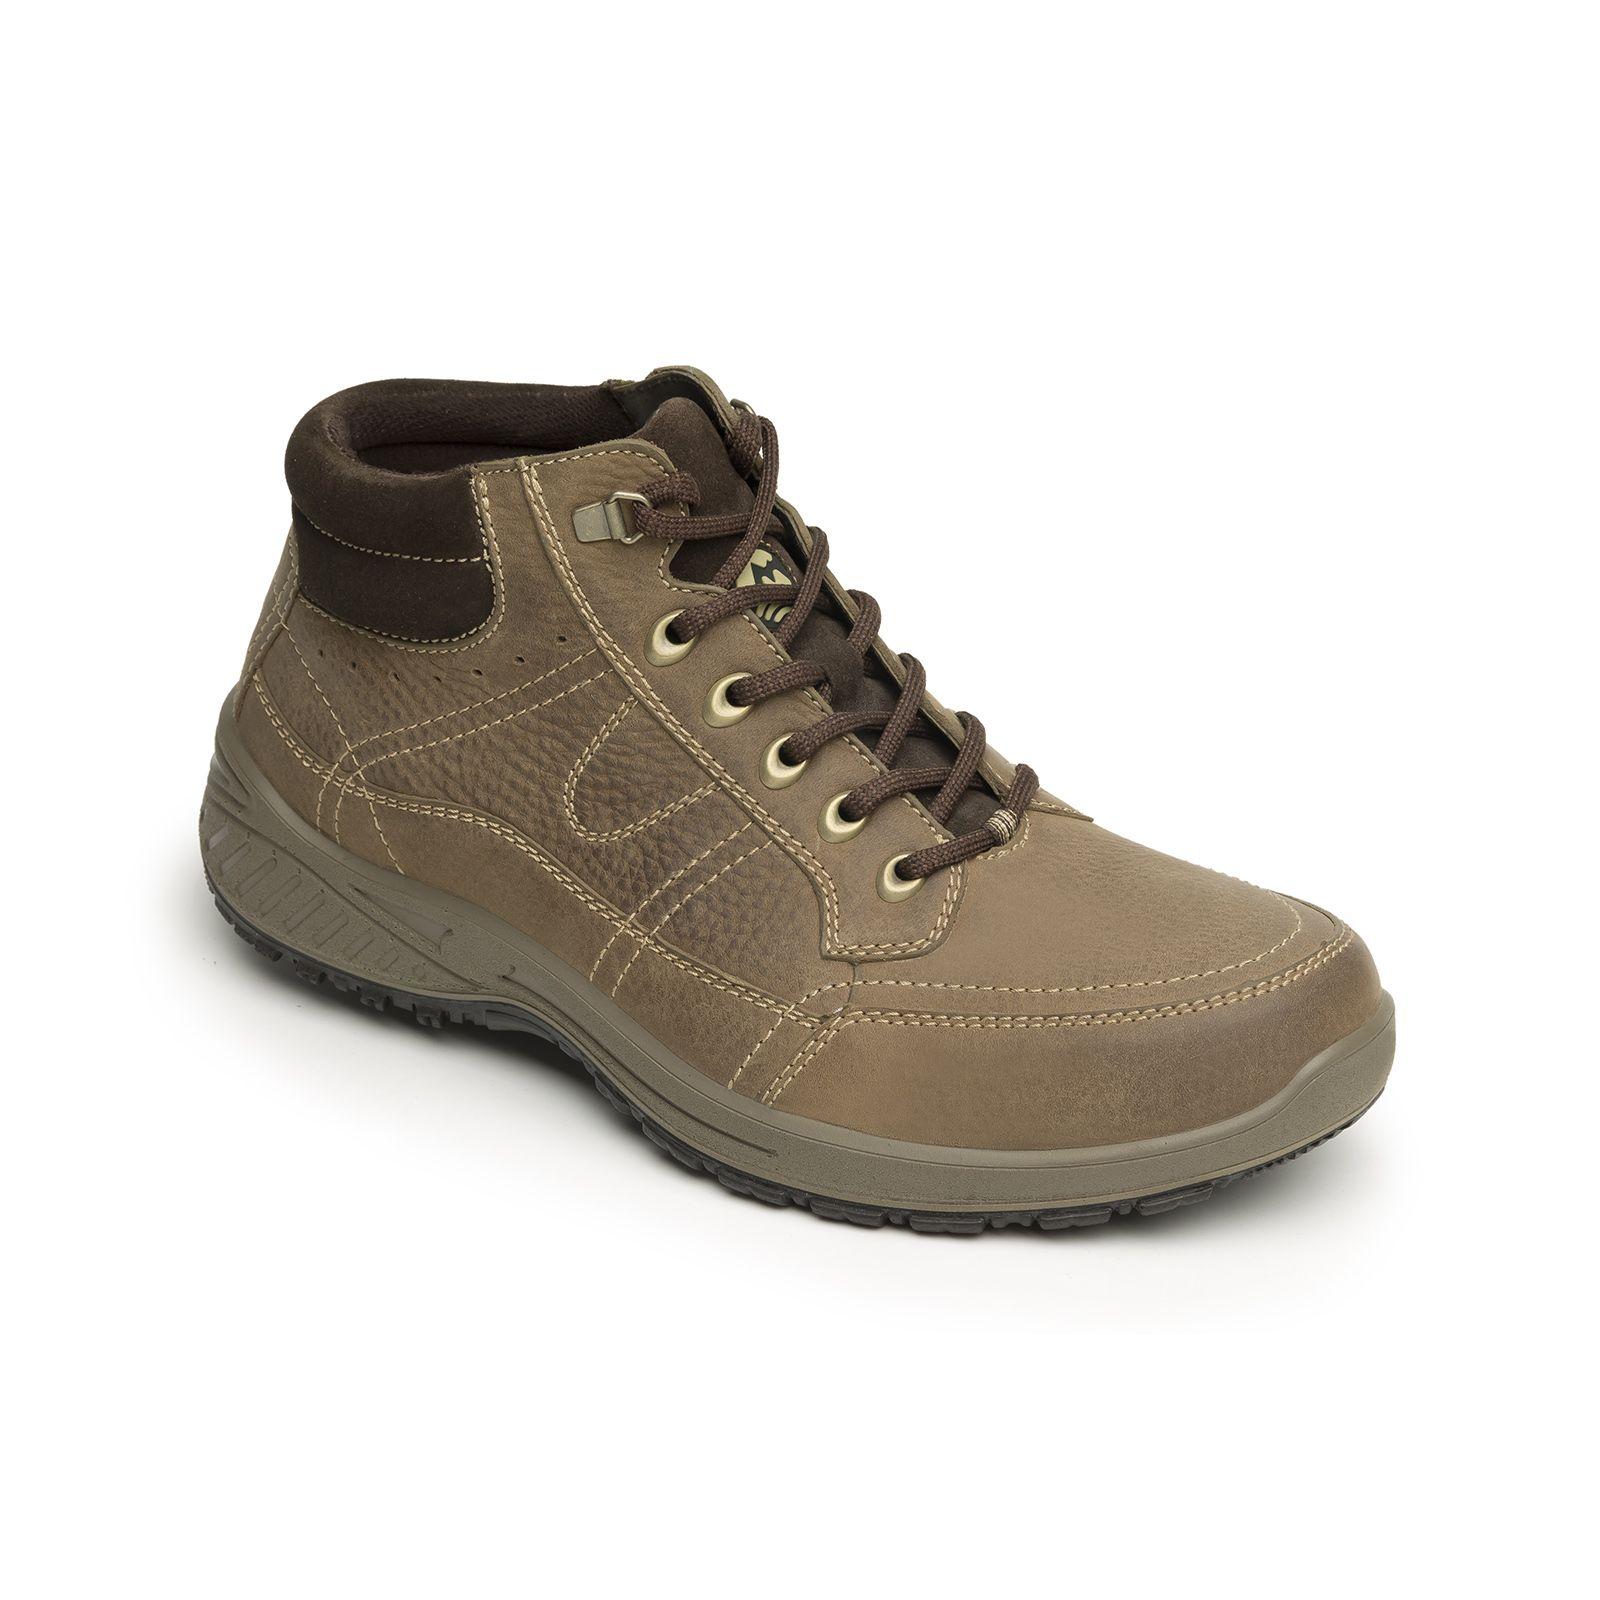 'Zapato antifortunistica Hombre Taxi S3SRC U-Power Marrón Size: 43 1cwTrfT08